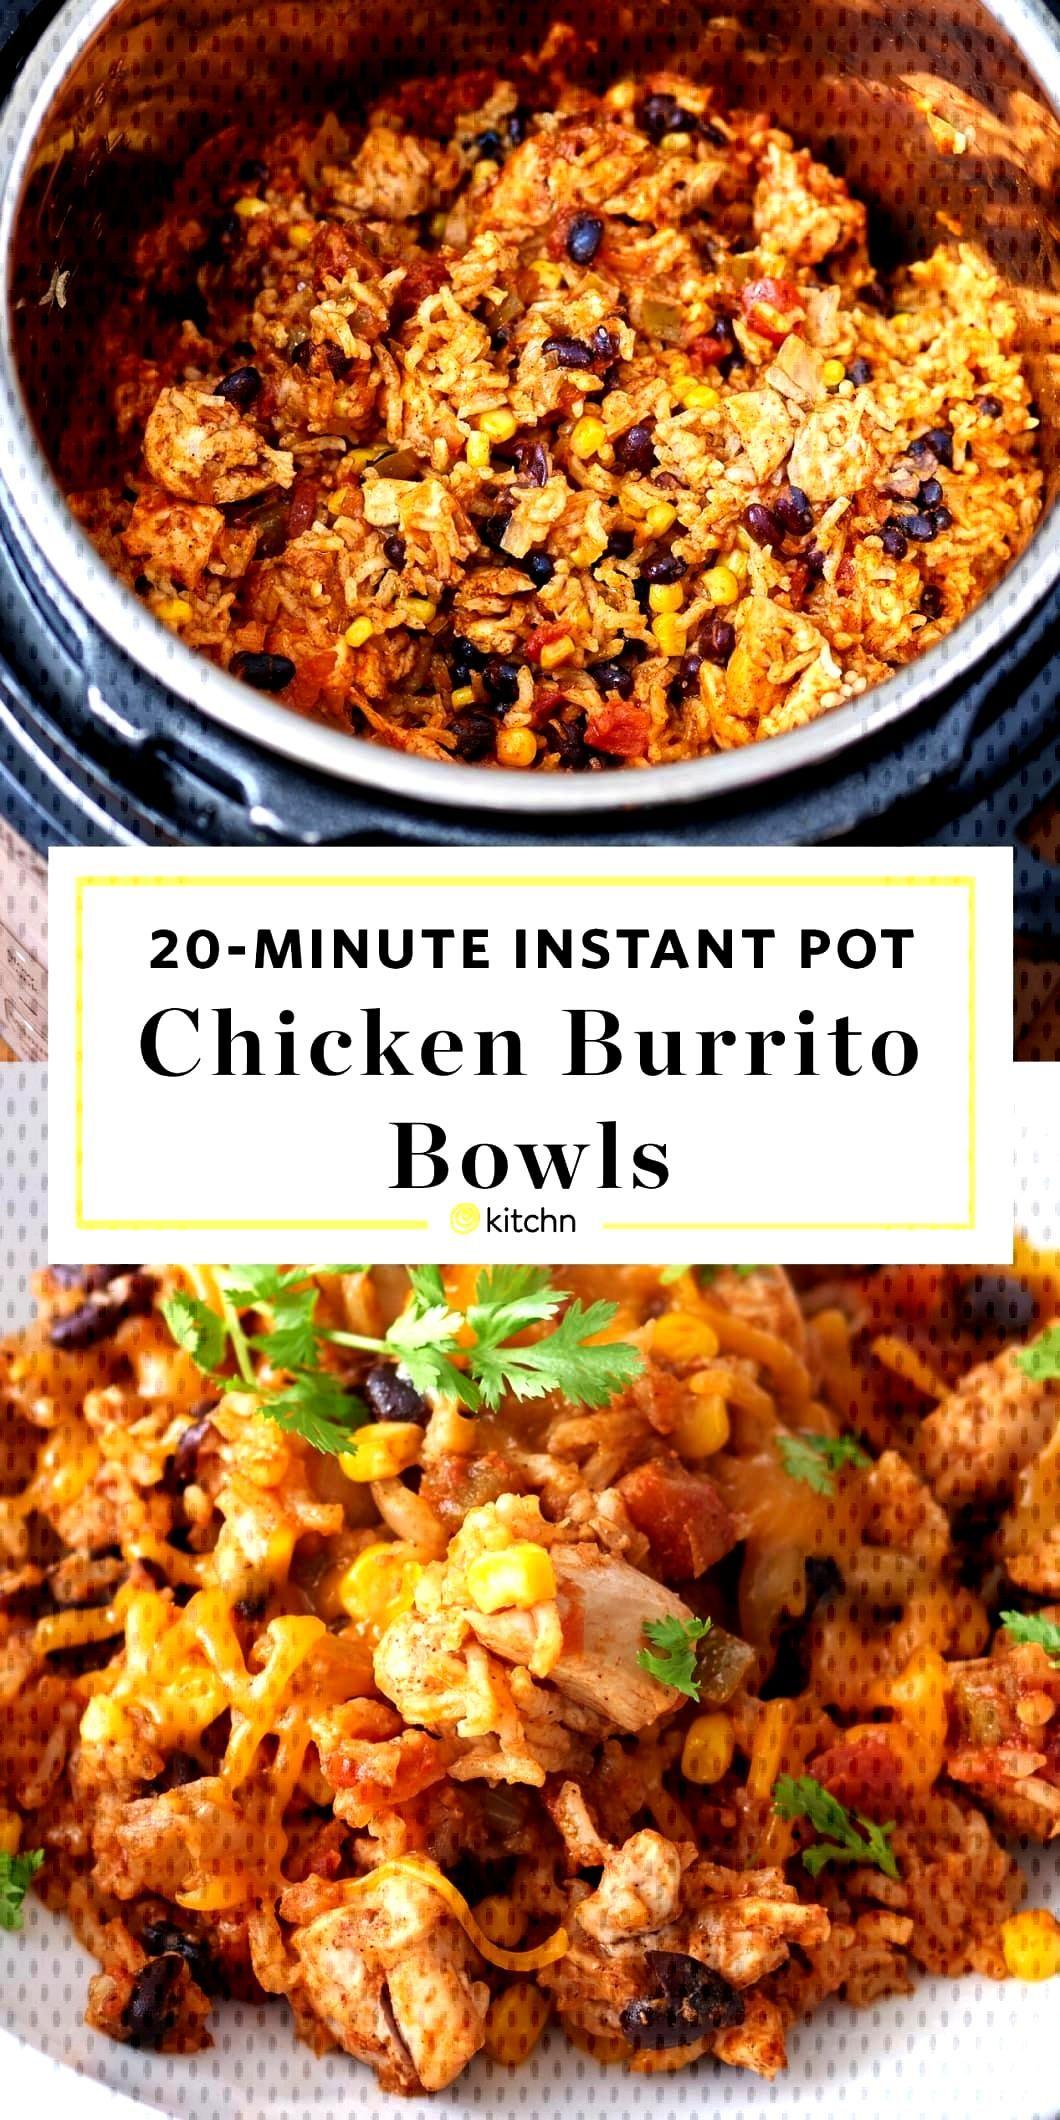 Instant Pot Chicken Burrito Bowls Pressure Cooking Recipe